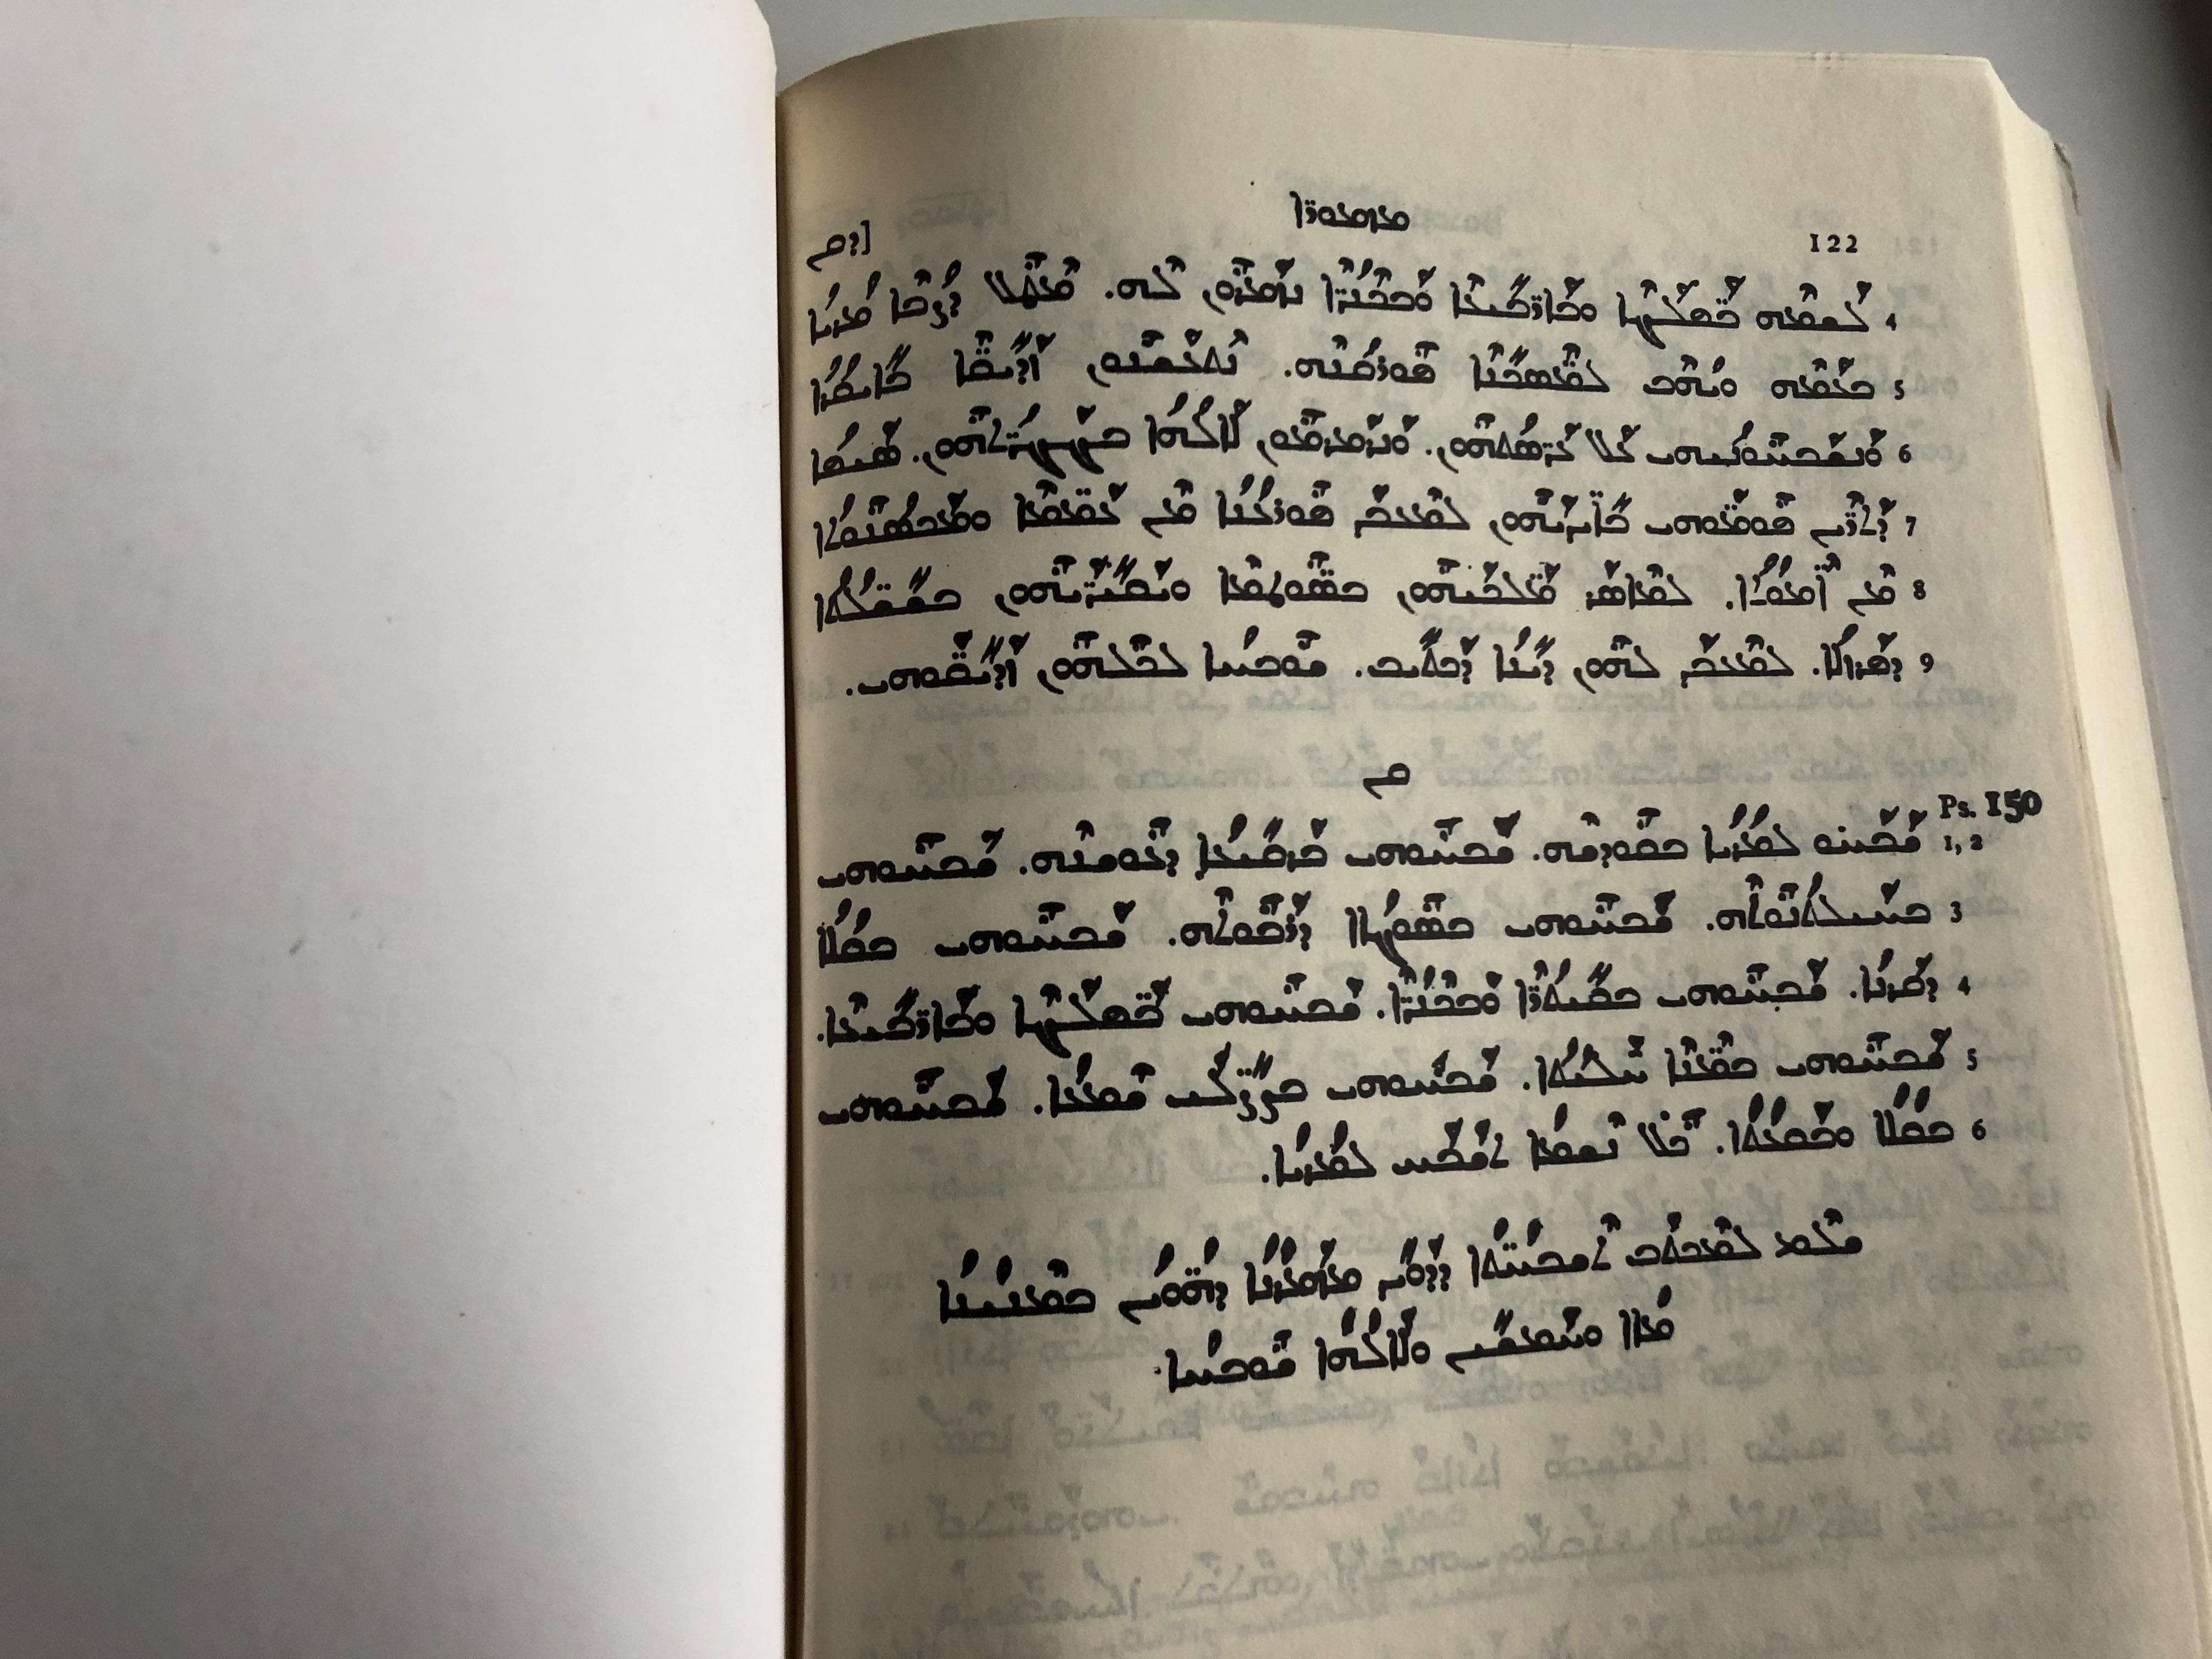 syriac-new-testament-and-psalms-ubs-epf-1998-pshitto-nt-9-.jpg